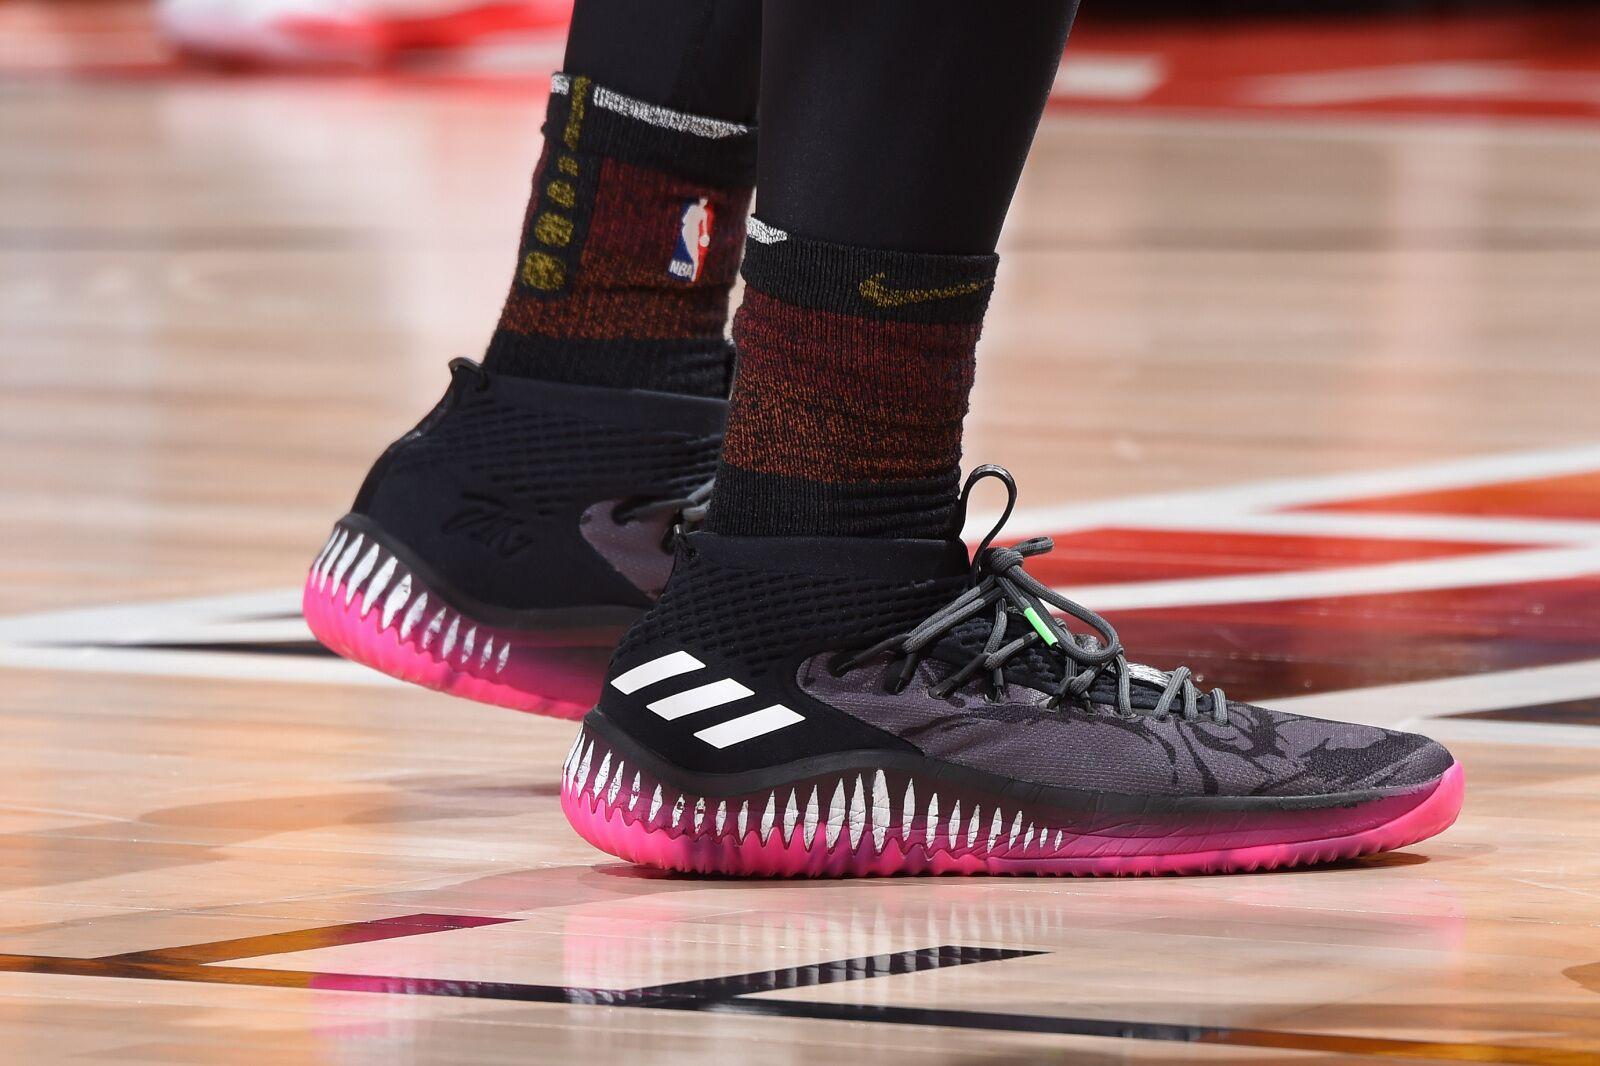 c22ca616d70 Utah Jazz  Donovan Mitchell sneakers revealed for sophomore season